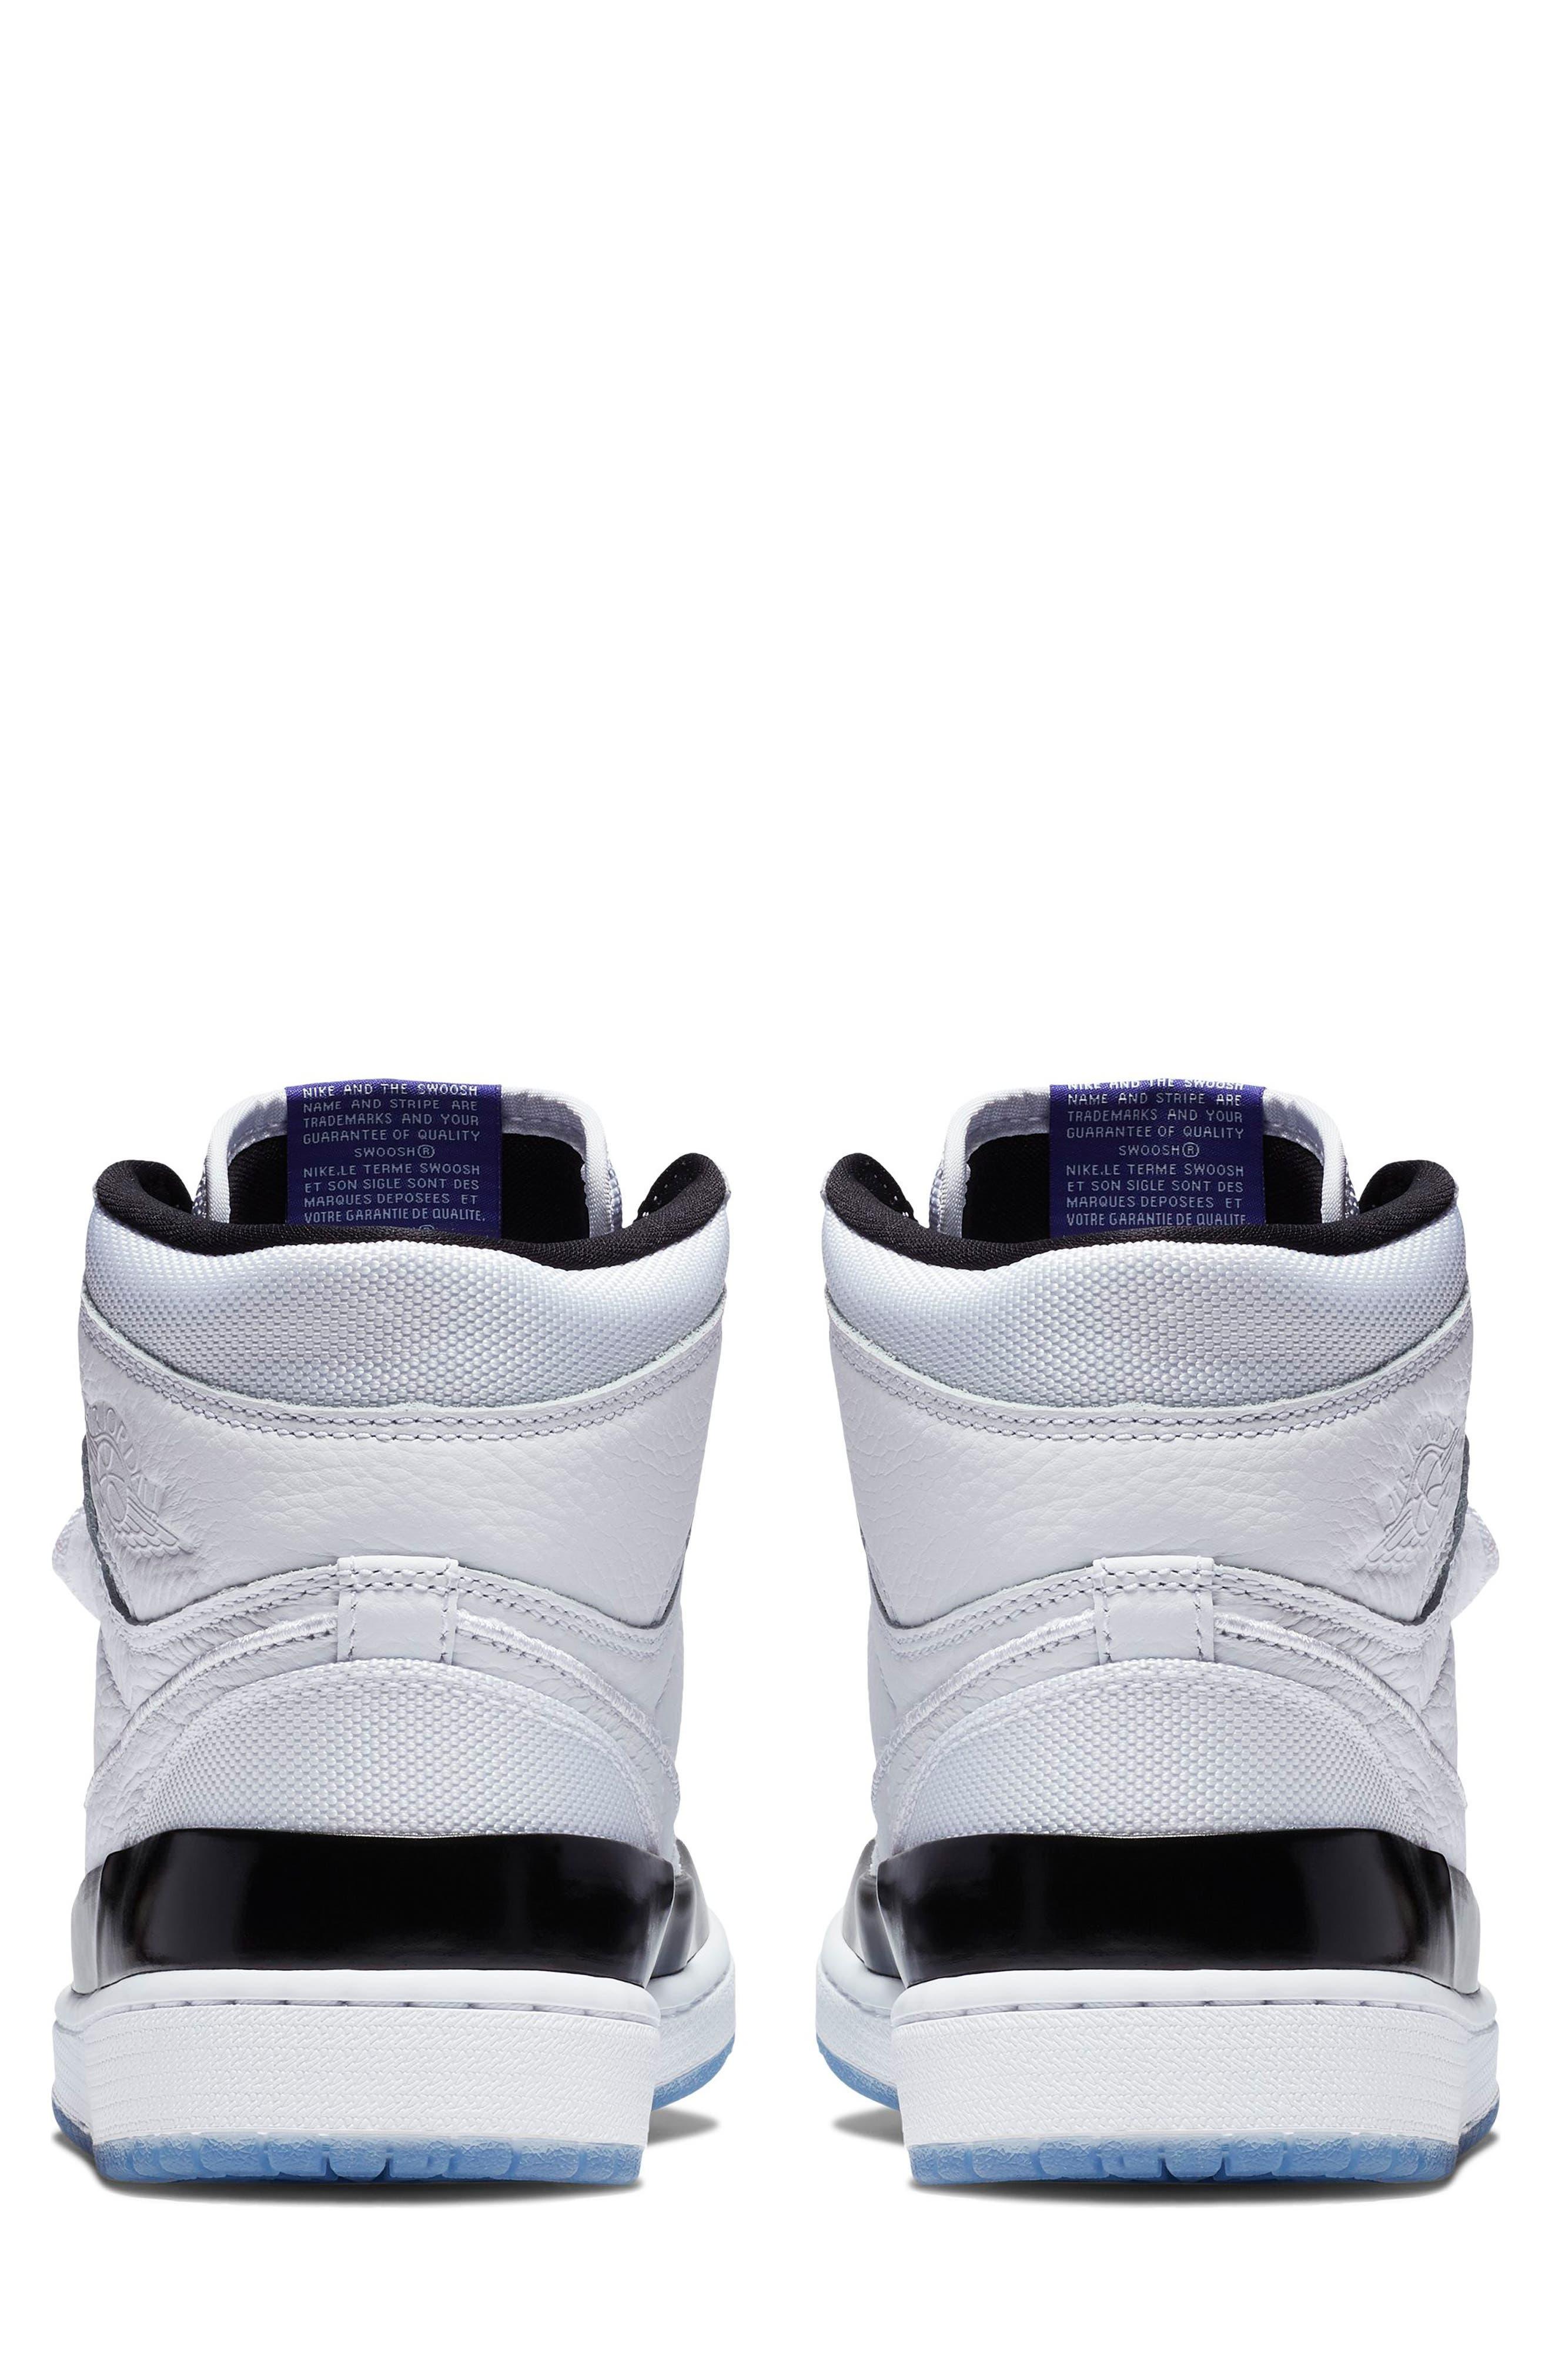 NIKE, Air Jordan 1 Retro High Double Strap Sneaker, Alternate thumbnail 5, color, WHITE/ DARK CONCORD/ BLACK